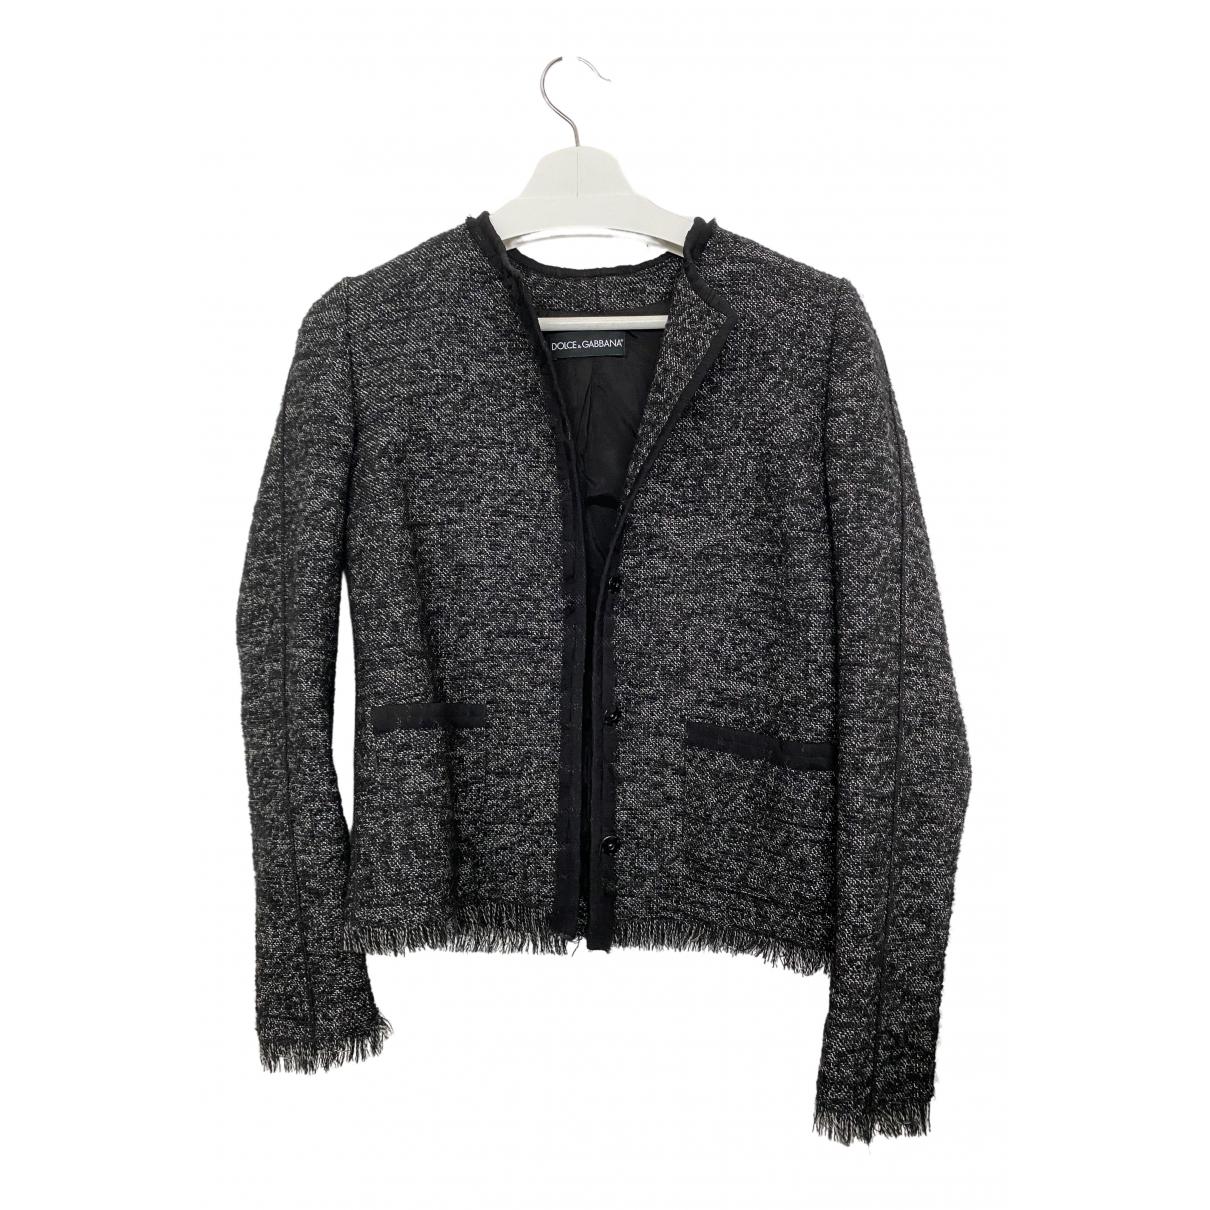 Dolce & Gabbana \N Jacke in  Bunt Tweed